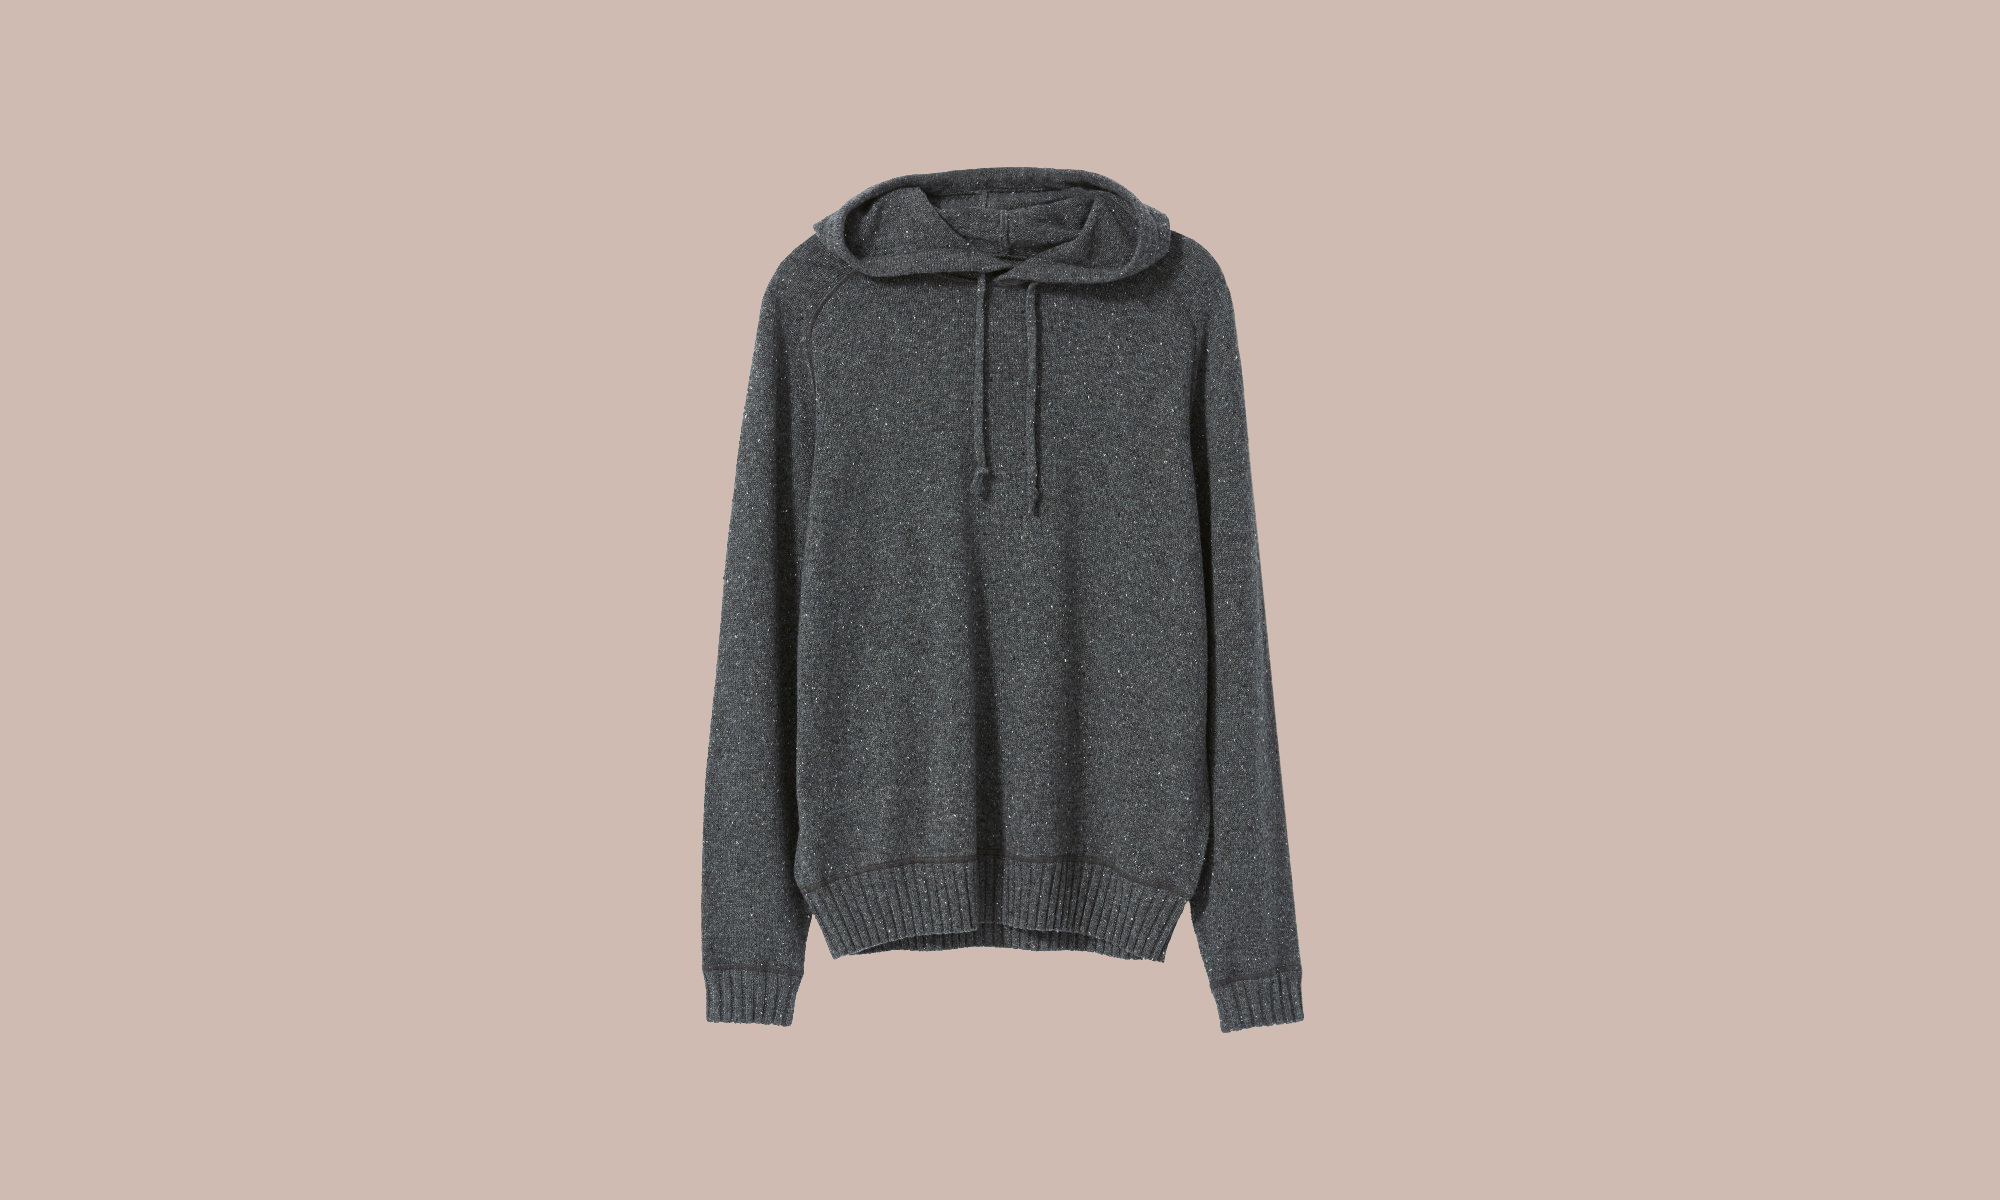 Everlane gray cashmere hoodie